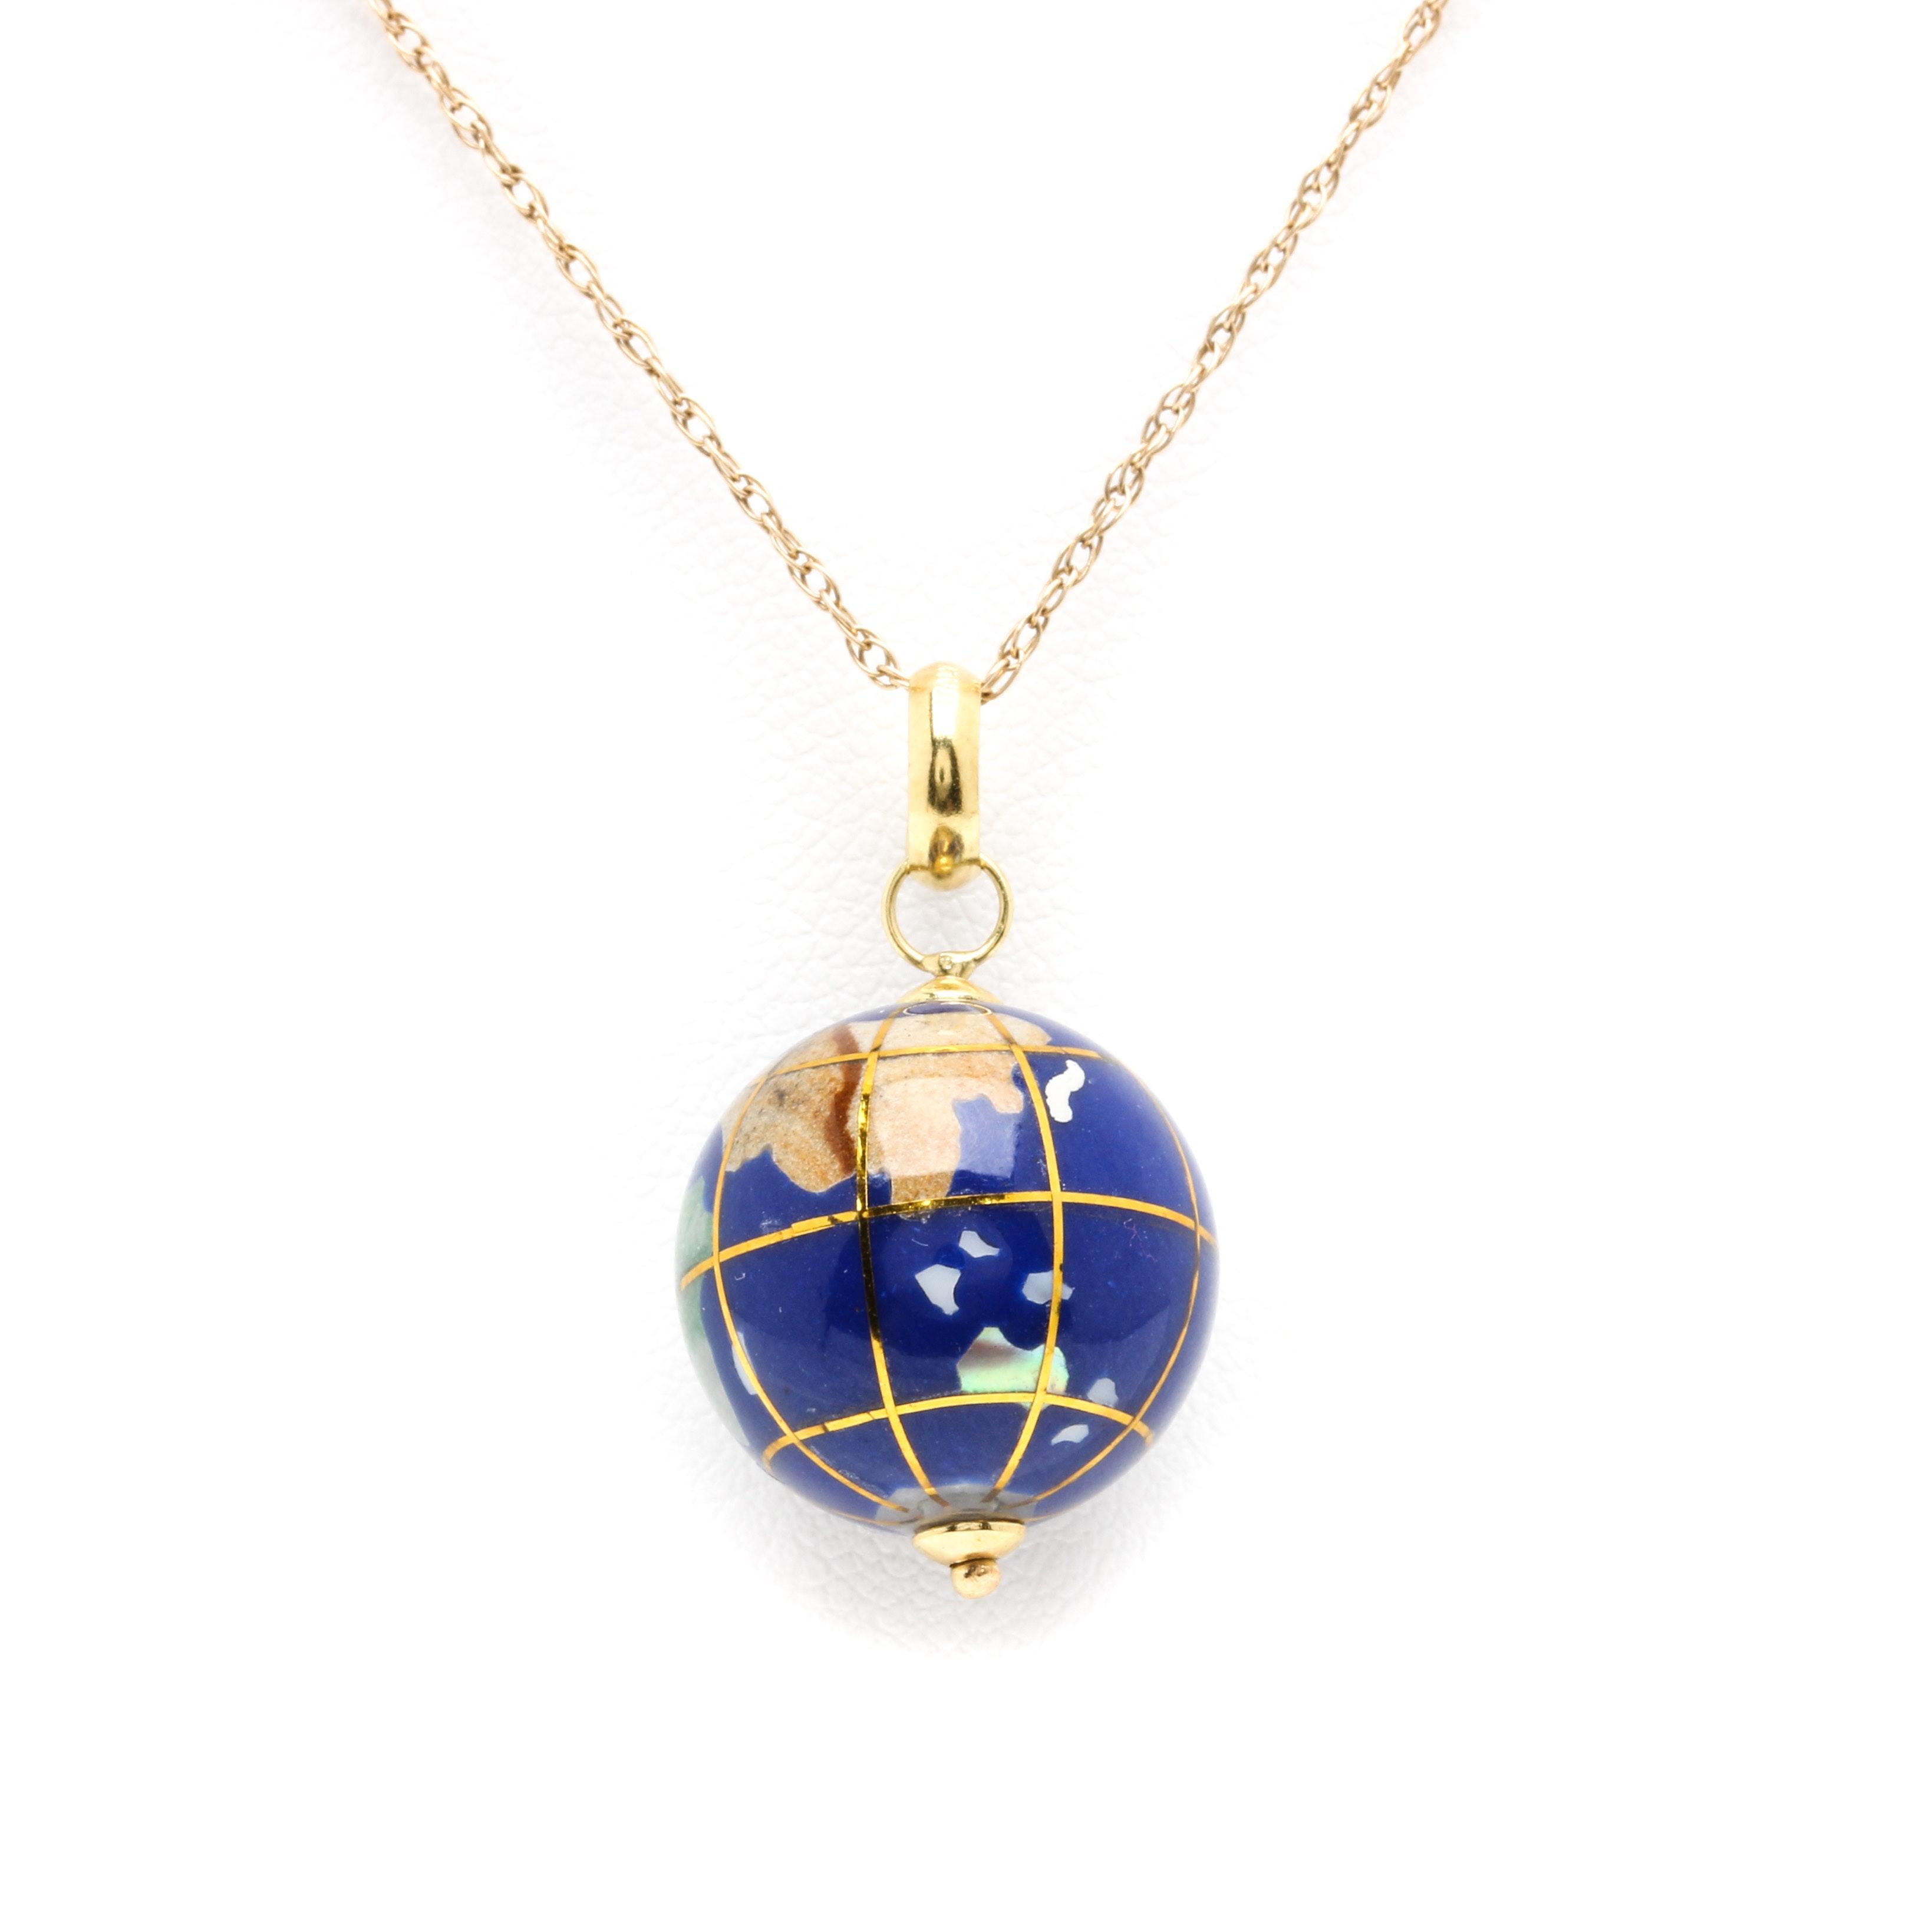 14K Yellow Gold Gemstone Globe Pendant Necklace